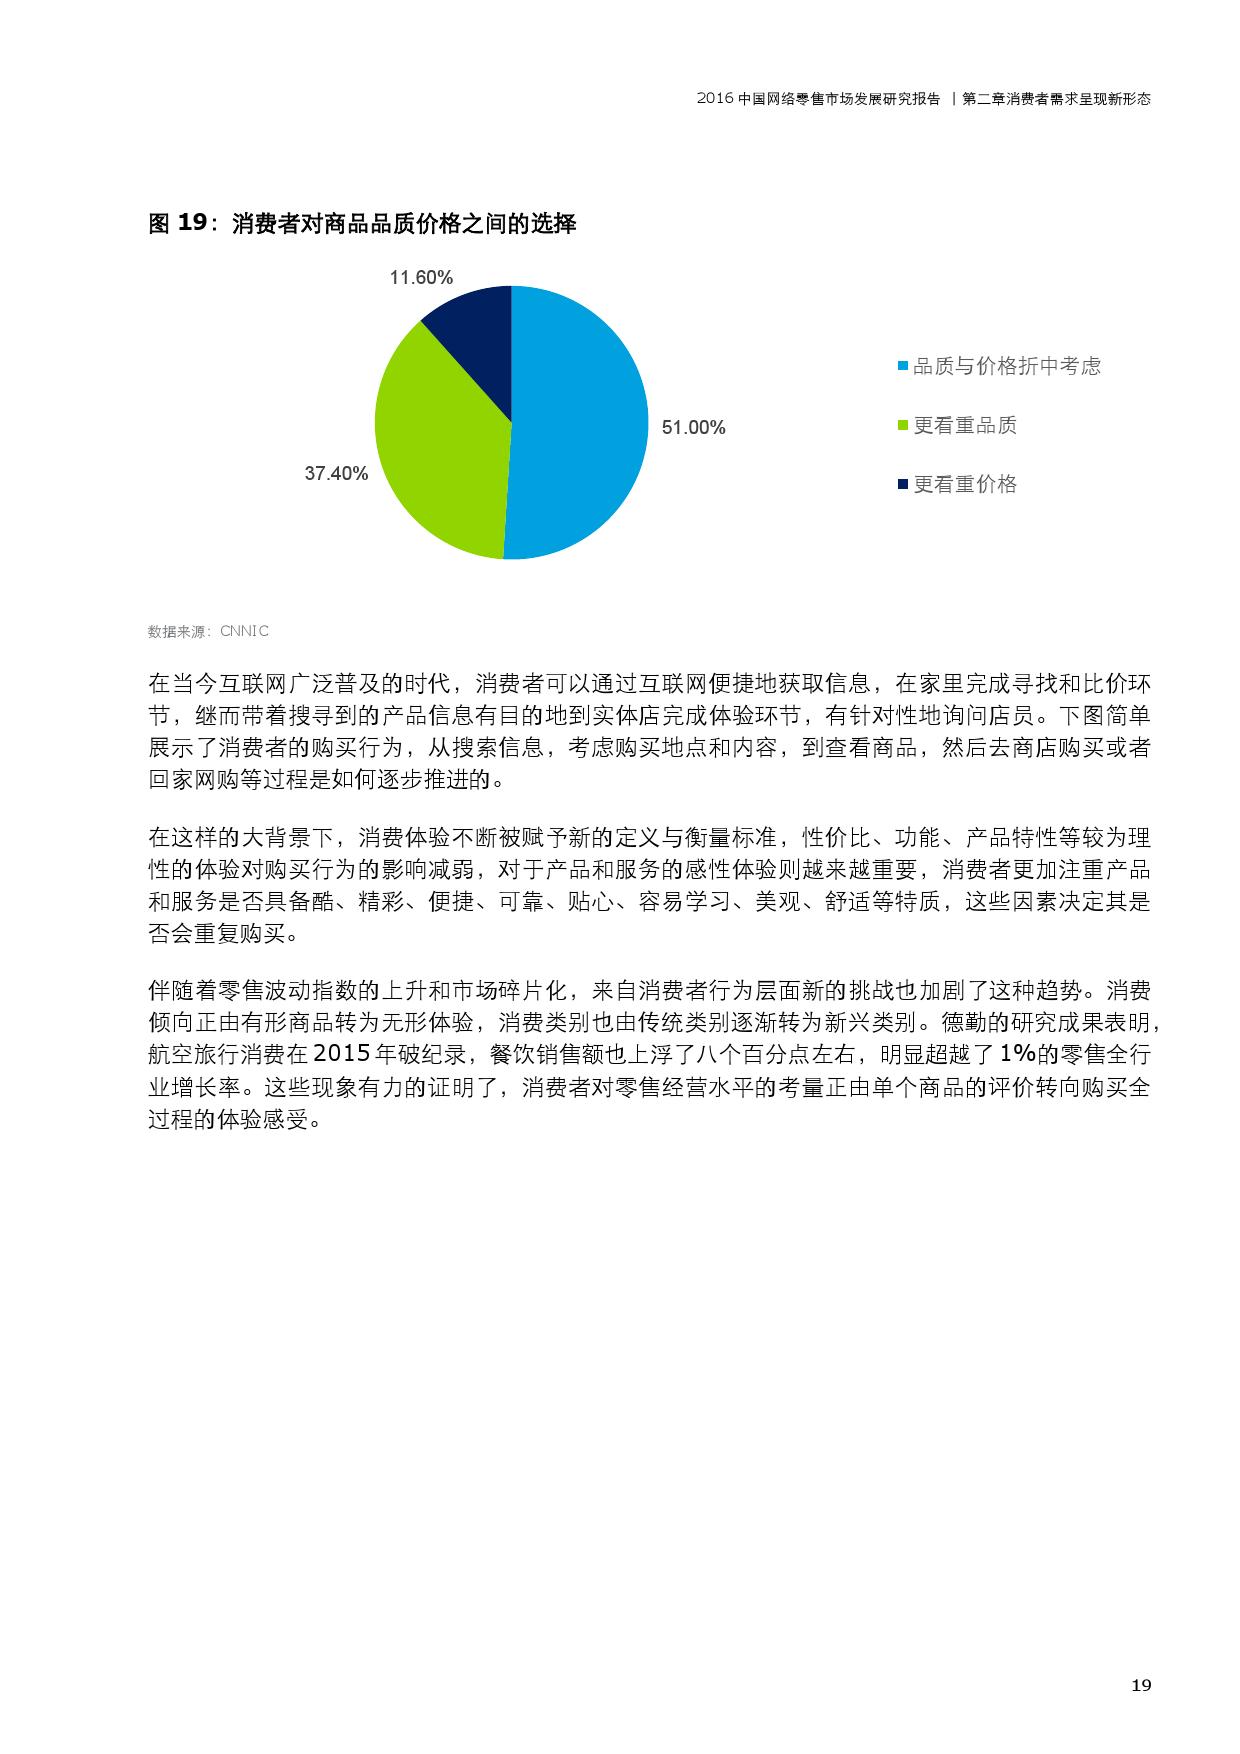 2016%e4%b8%ad%e5%9b%bd%e7%bd%91%e7%bb%9c%e9%9b%b6%e5%94%ae%e5%b8%82%e5%9c%ba%e5%8f%91%e5%b1%95%e7%a0%94%e7%a9%b6%e6%8a%a5%e5%91%8a_000023